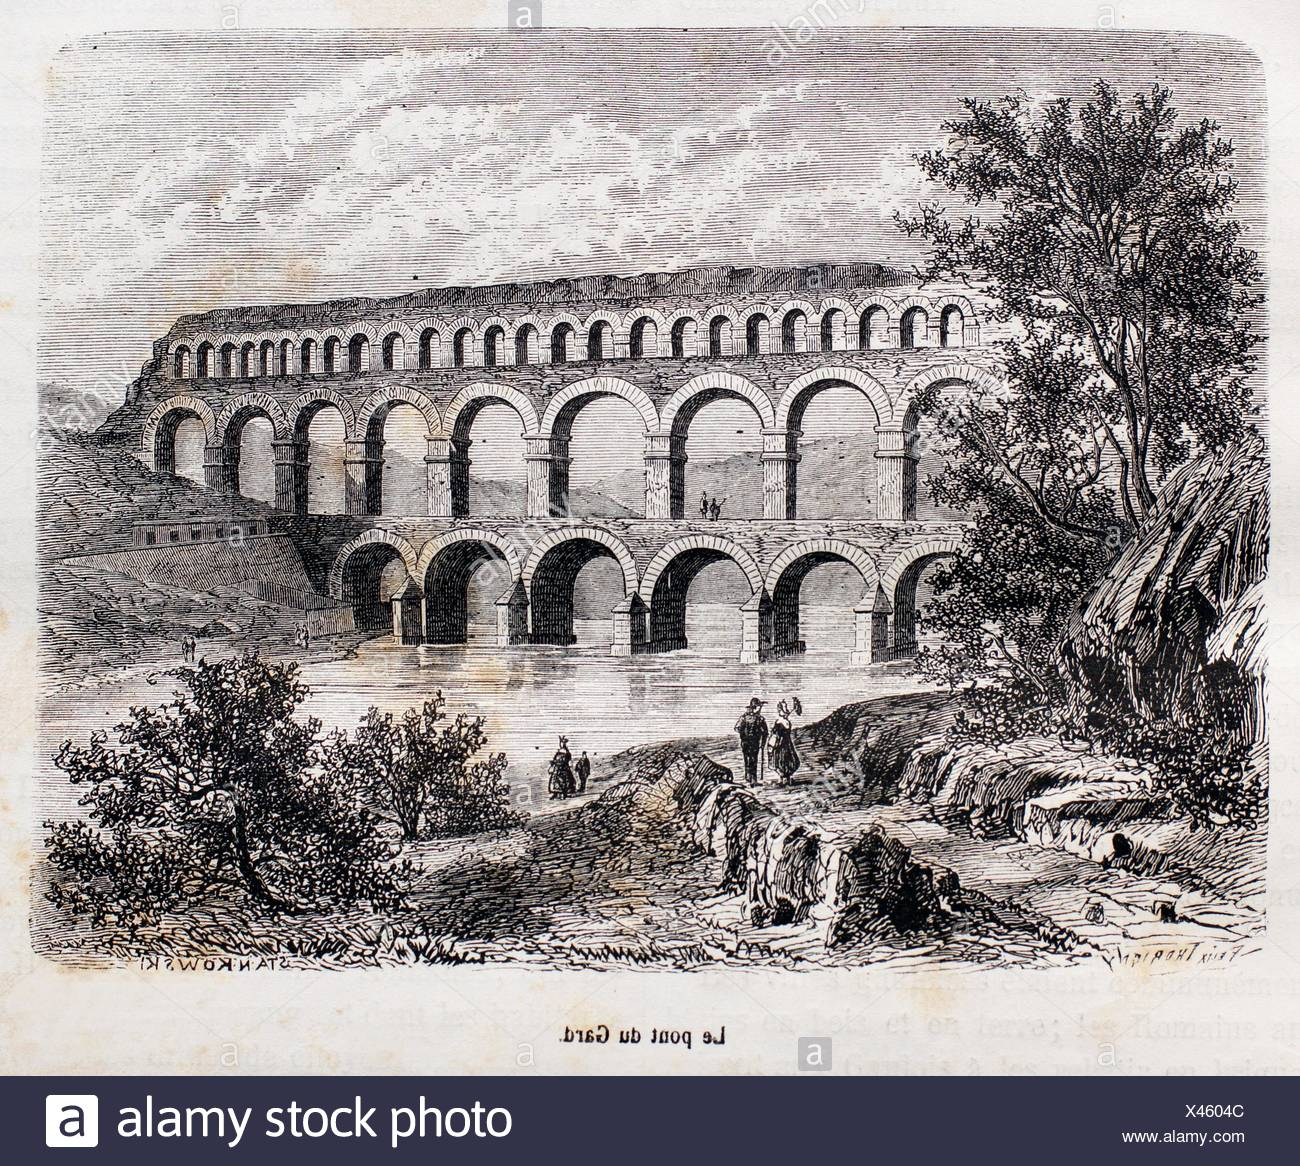 France, History- ´Le pond du Gard´ -The Pont du Gard is a notable ancient Roman aqueduct bridge that crosses the Gard River in - Stock Image